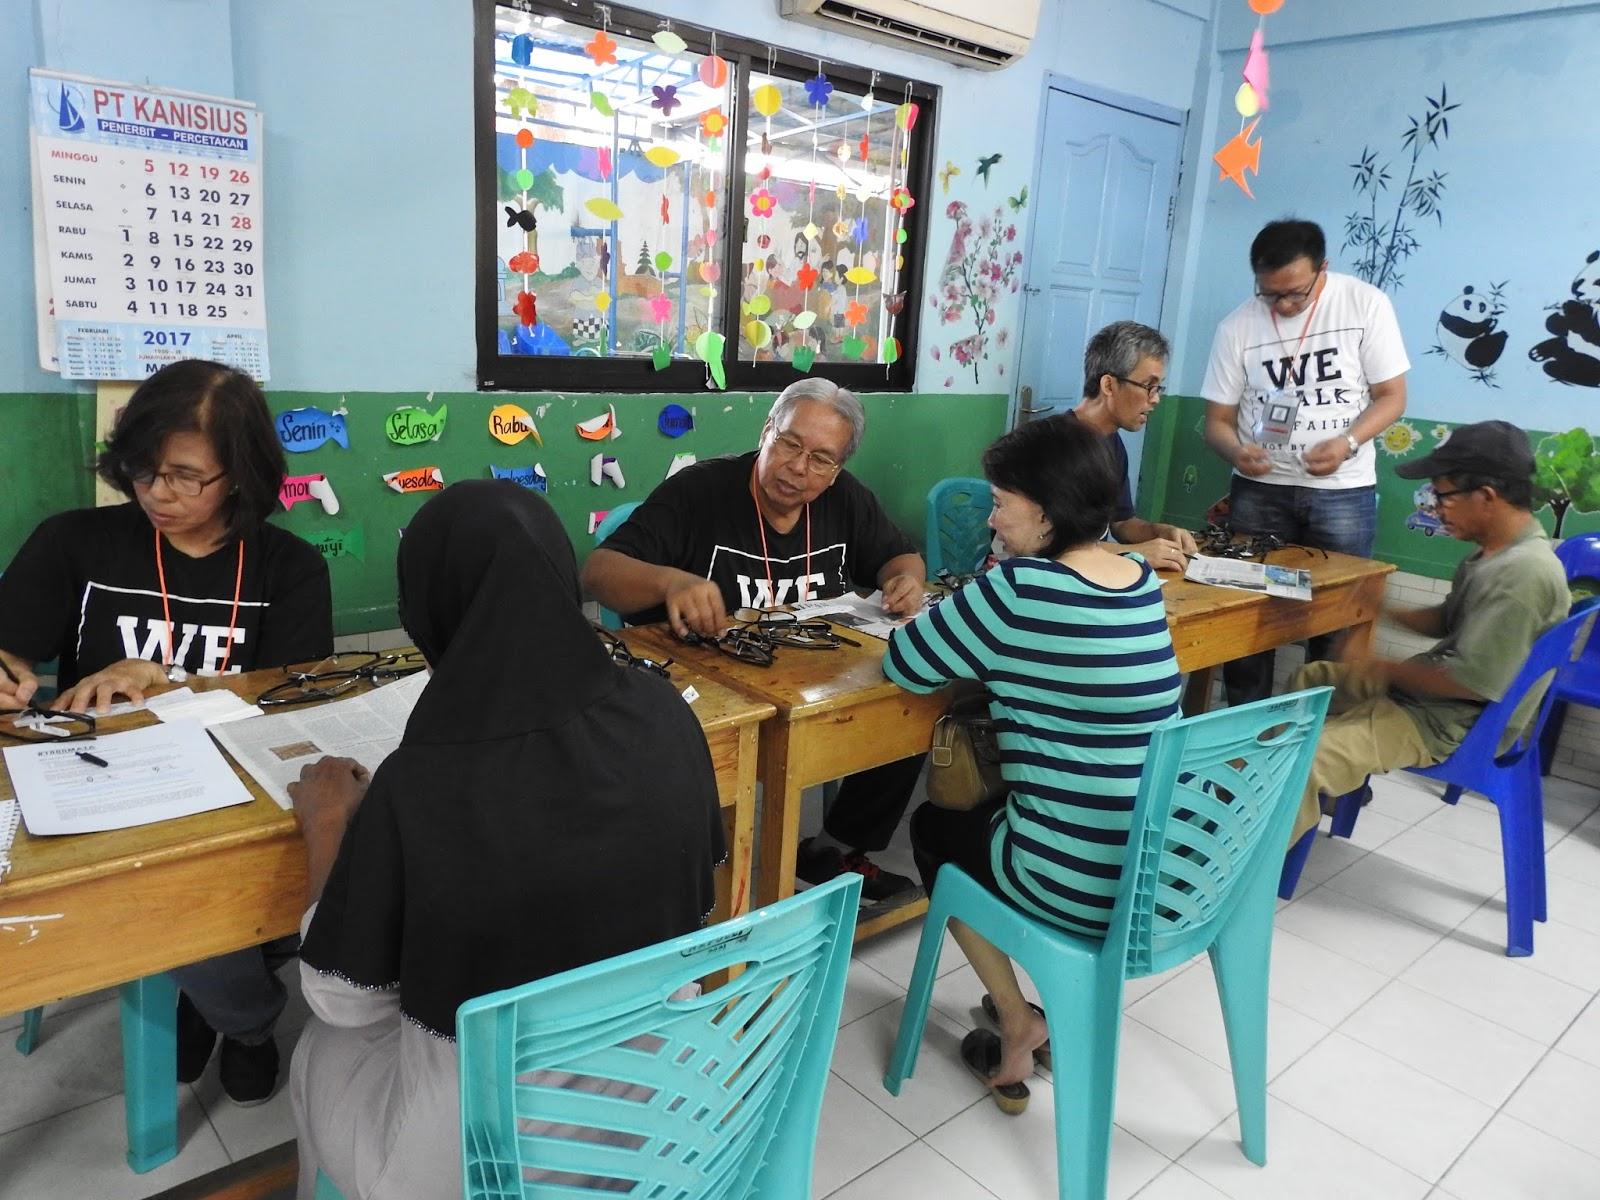 Bakti Sosial XI - 1000 Mata Anak Bangsa Melihat Terang - Teluk Gong, Jakarta Barat image